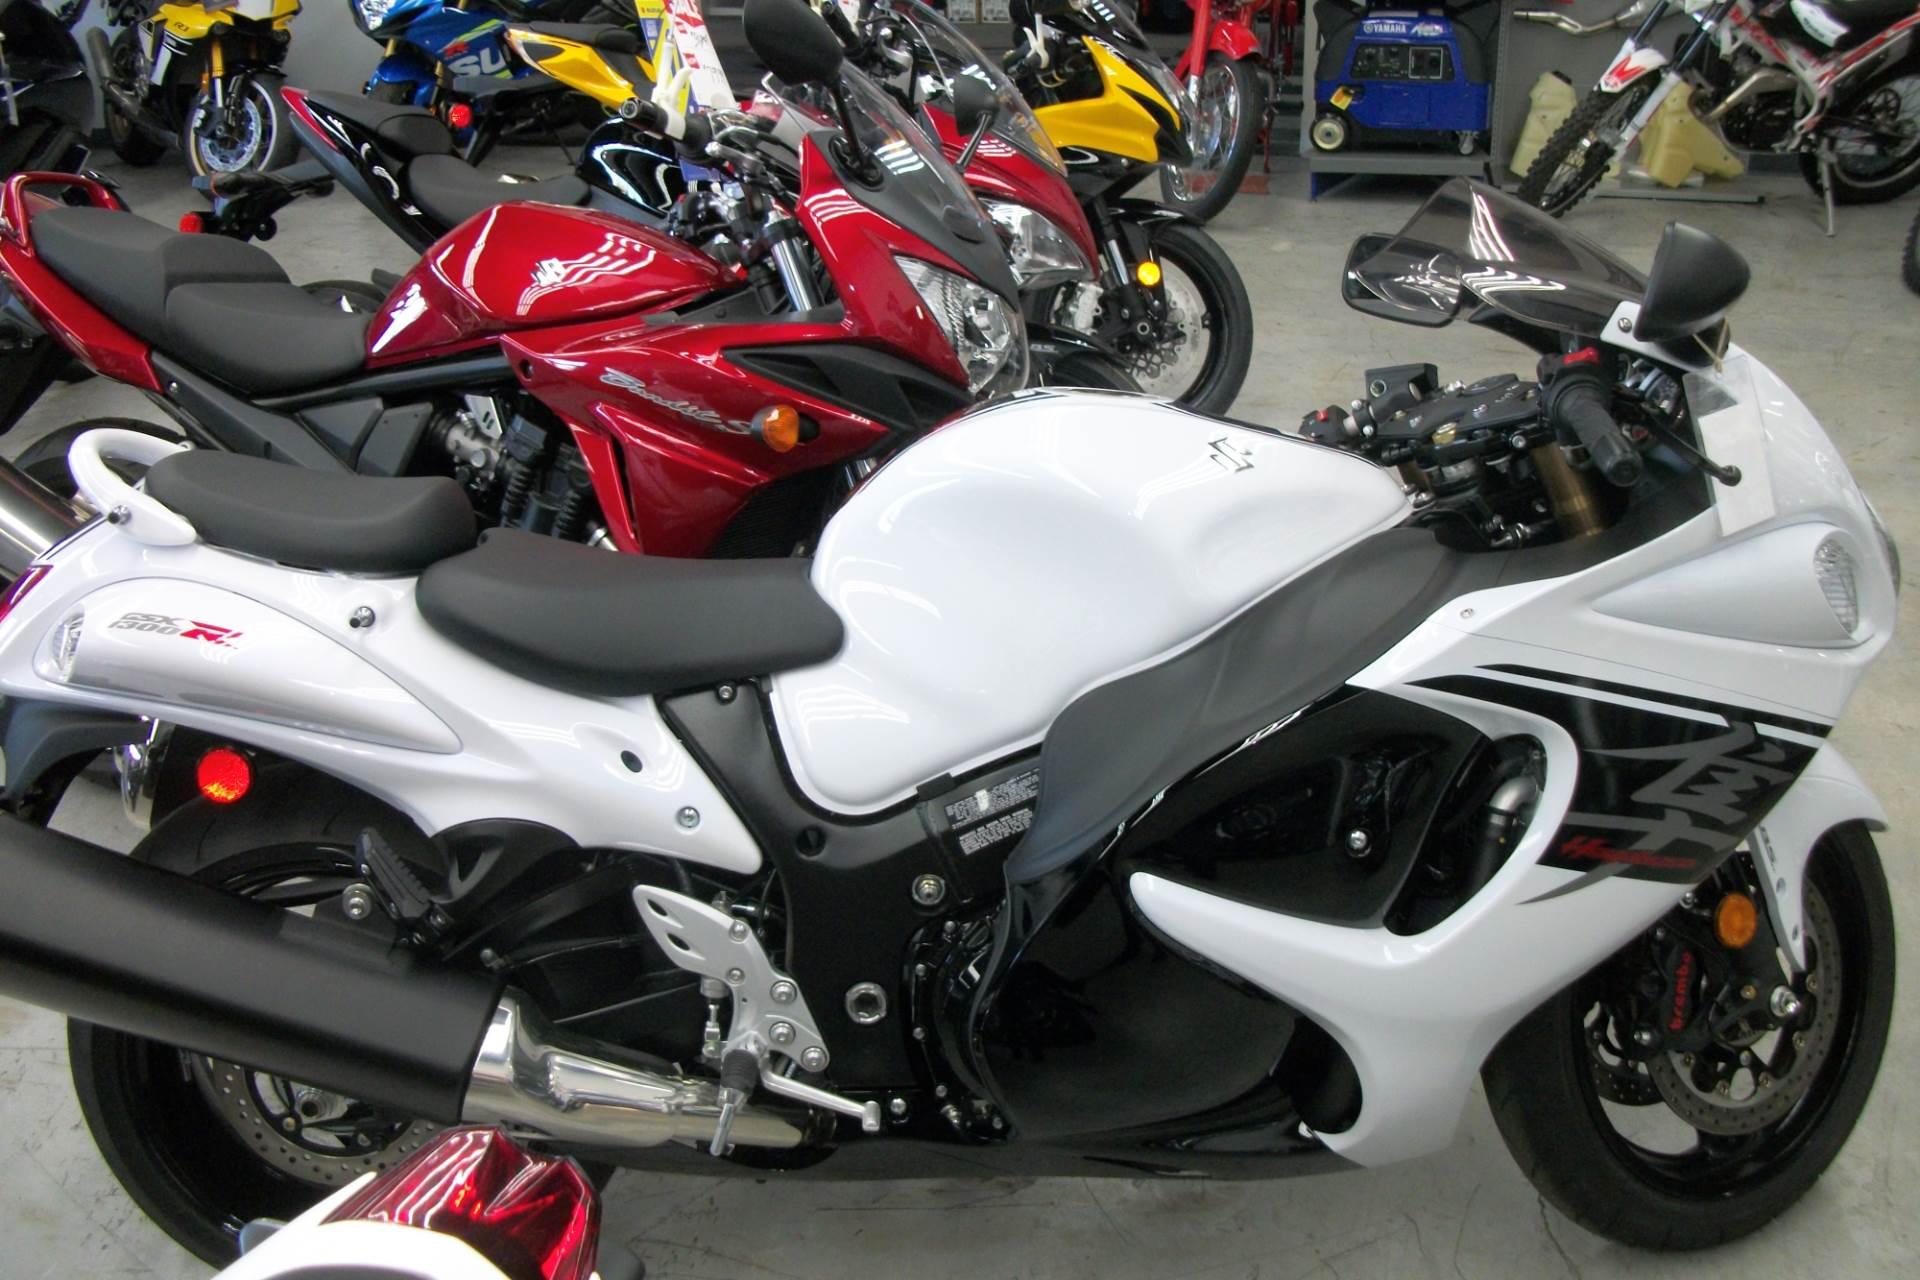 new 2017 suzuki hayabusa motorcycles in simi valley, ca